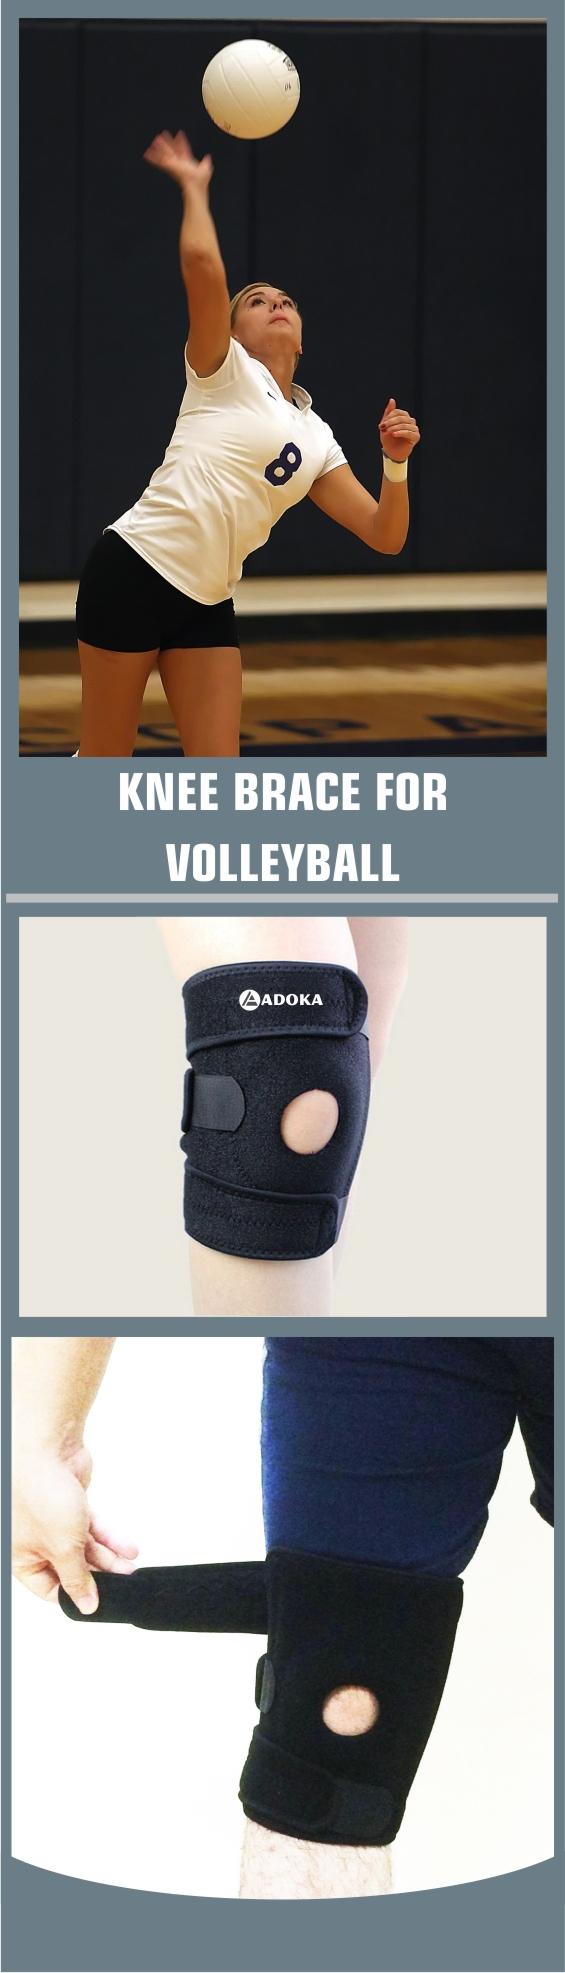 4c9ab8e98b Volleyball knee brace , knee brace for volleyball, knee brace volleyball,  Best Volleyball knee brace 2017 reviews, ankle braces for volleyball knee  brace ...